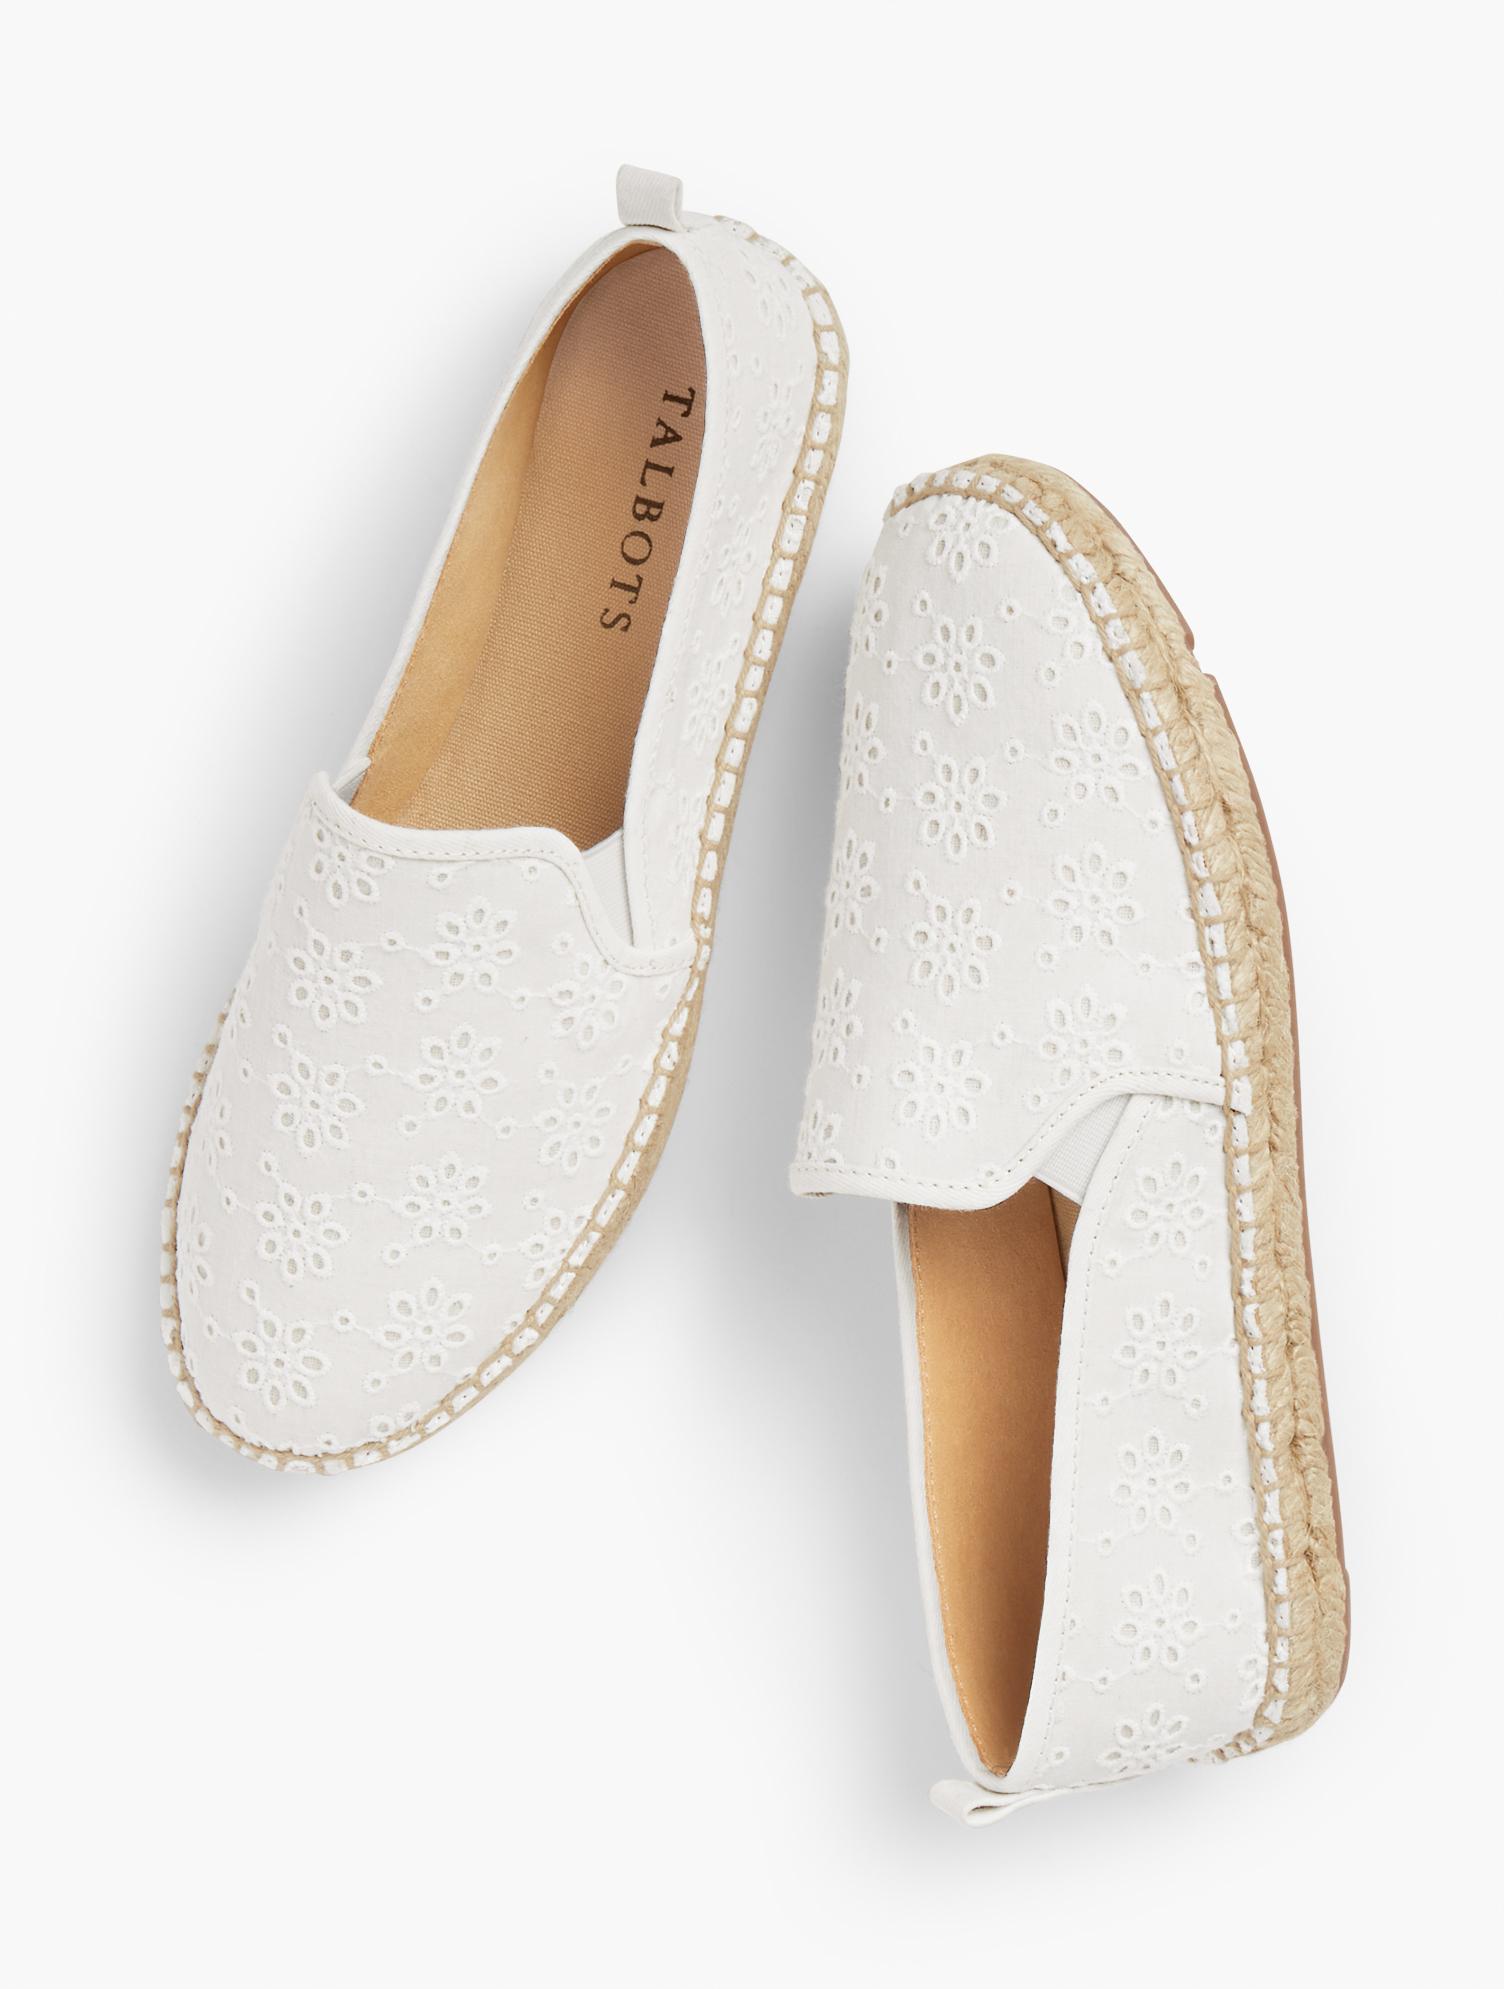 1980s Clothing, Fashion | 80s Style Clothes Izzy Eyelet Espadrille Flats - White - 11M Talbots $99.00 AT vintagedancer.com